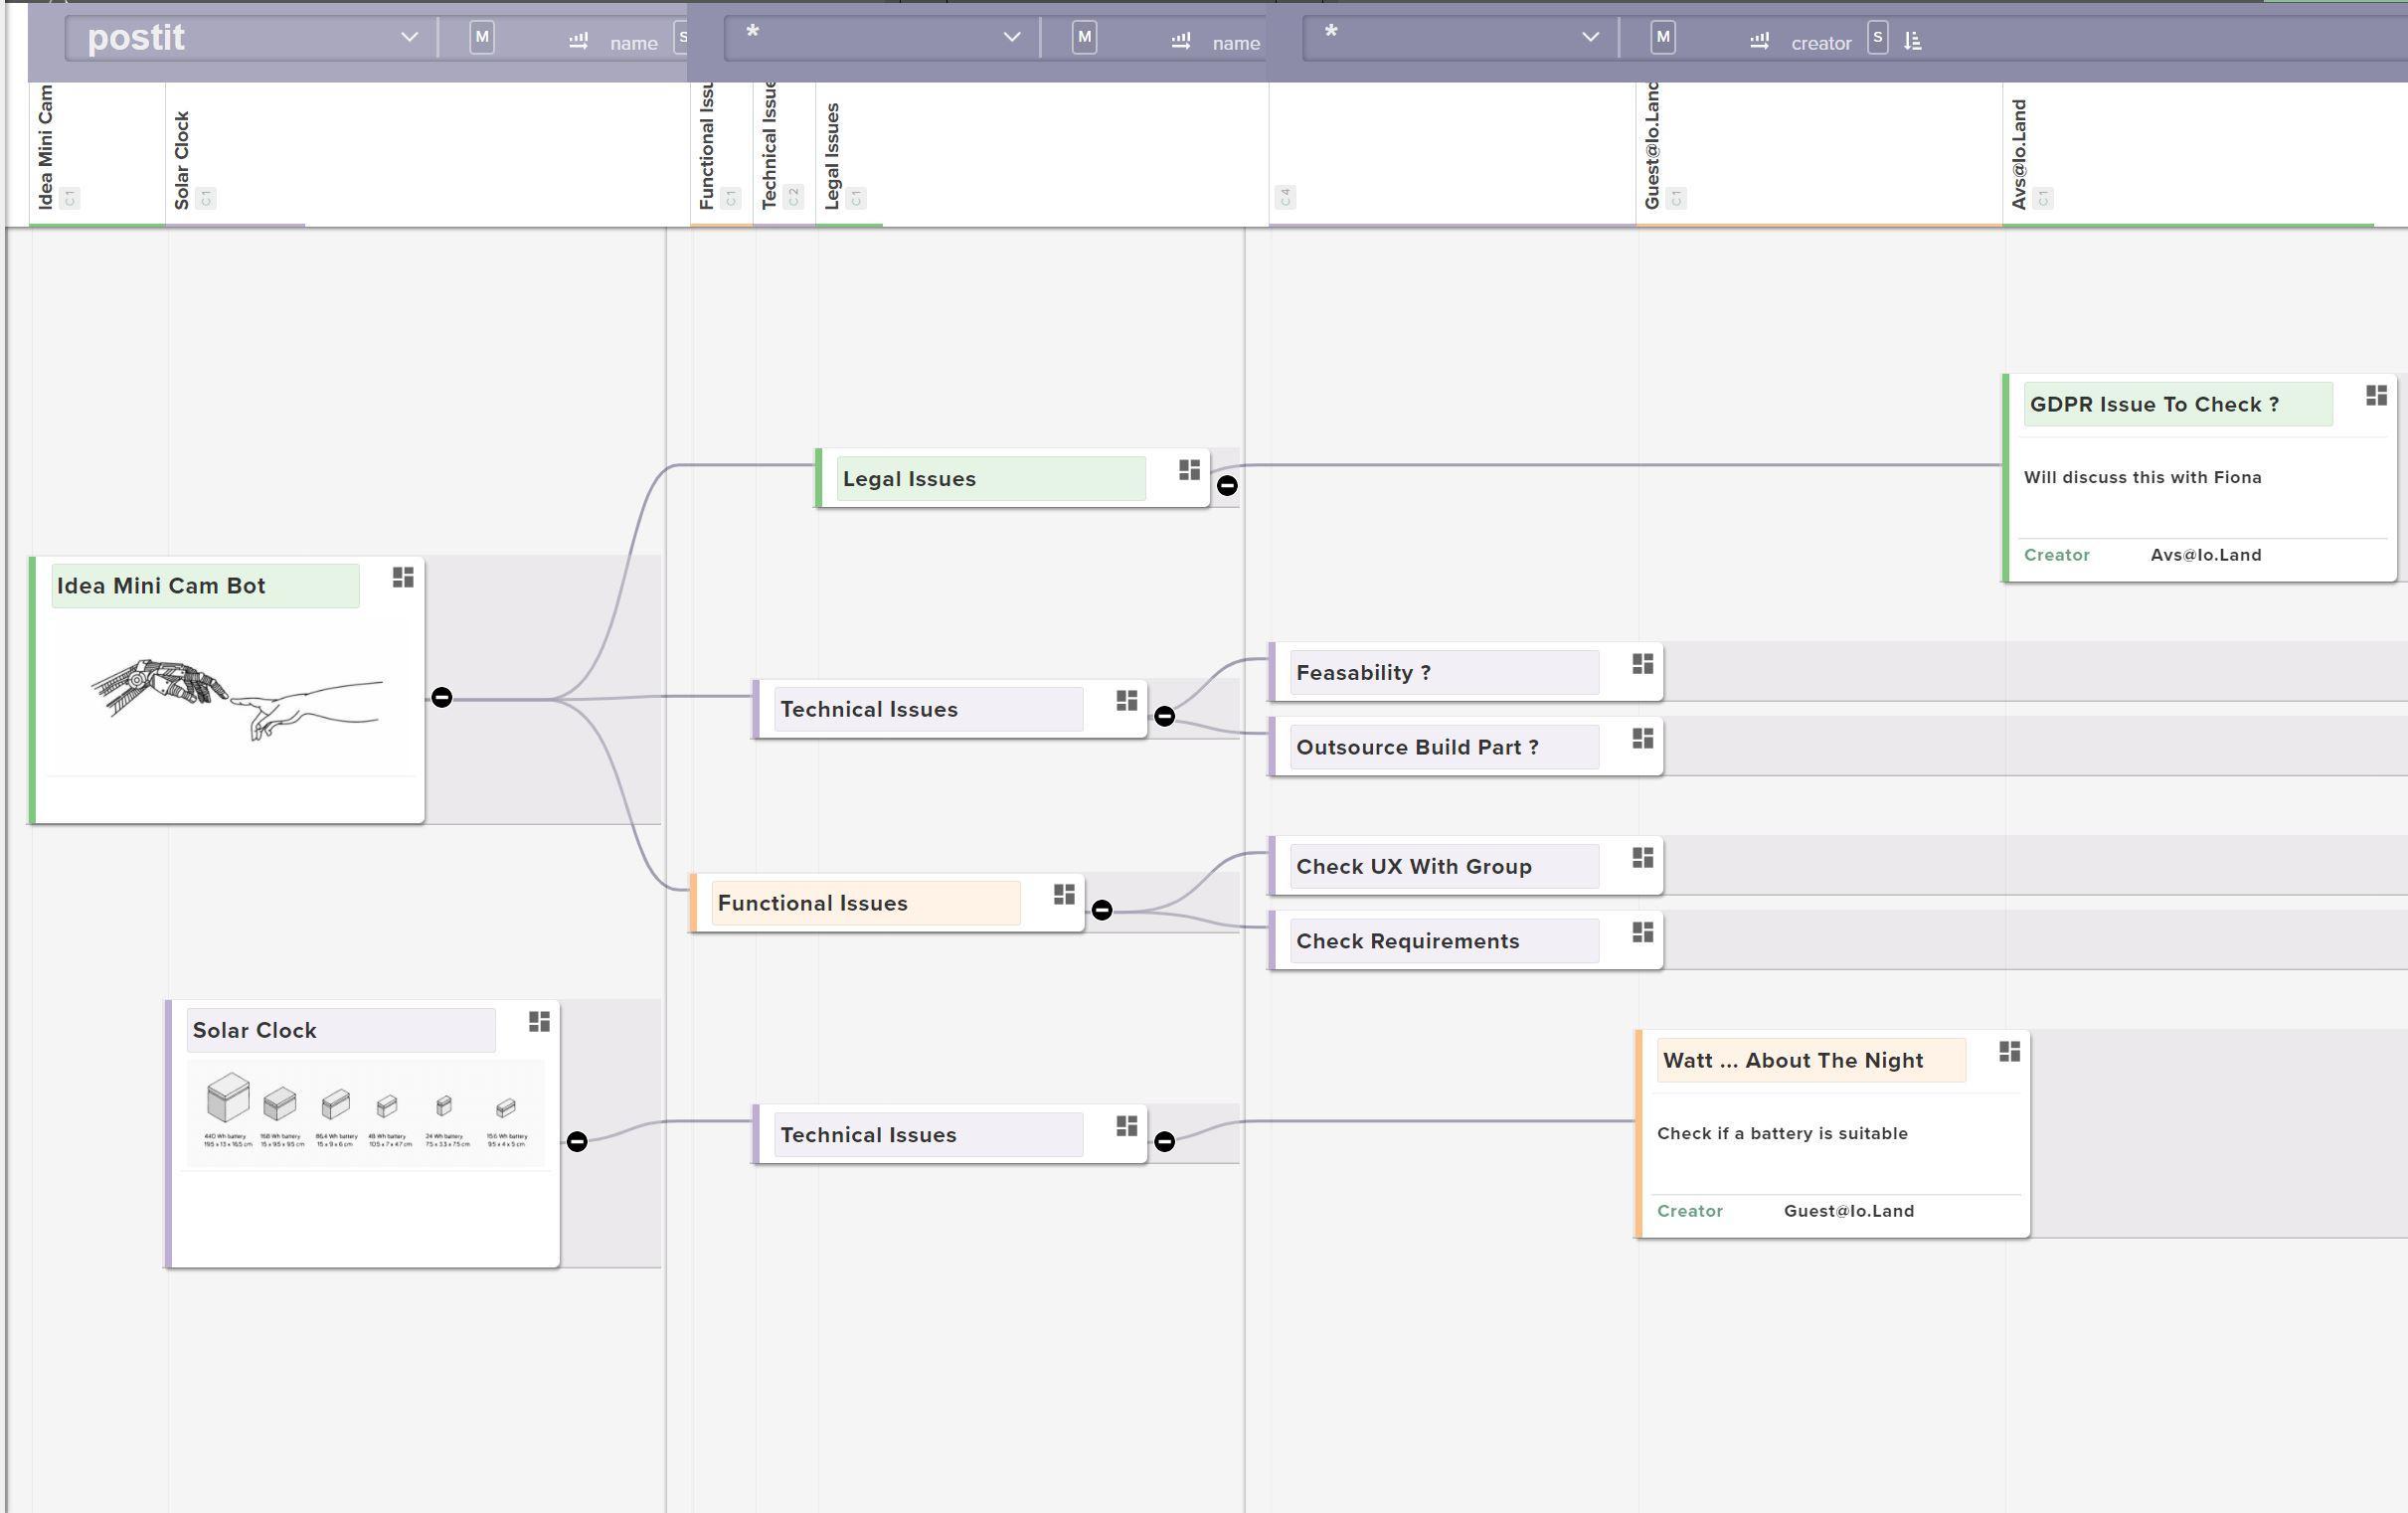 Avis Perspectives gestion de projet : Gestion de projet ultra visuelle - appvizer